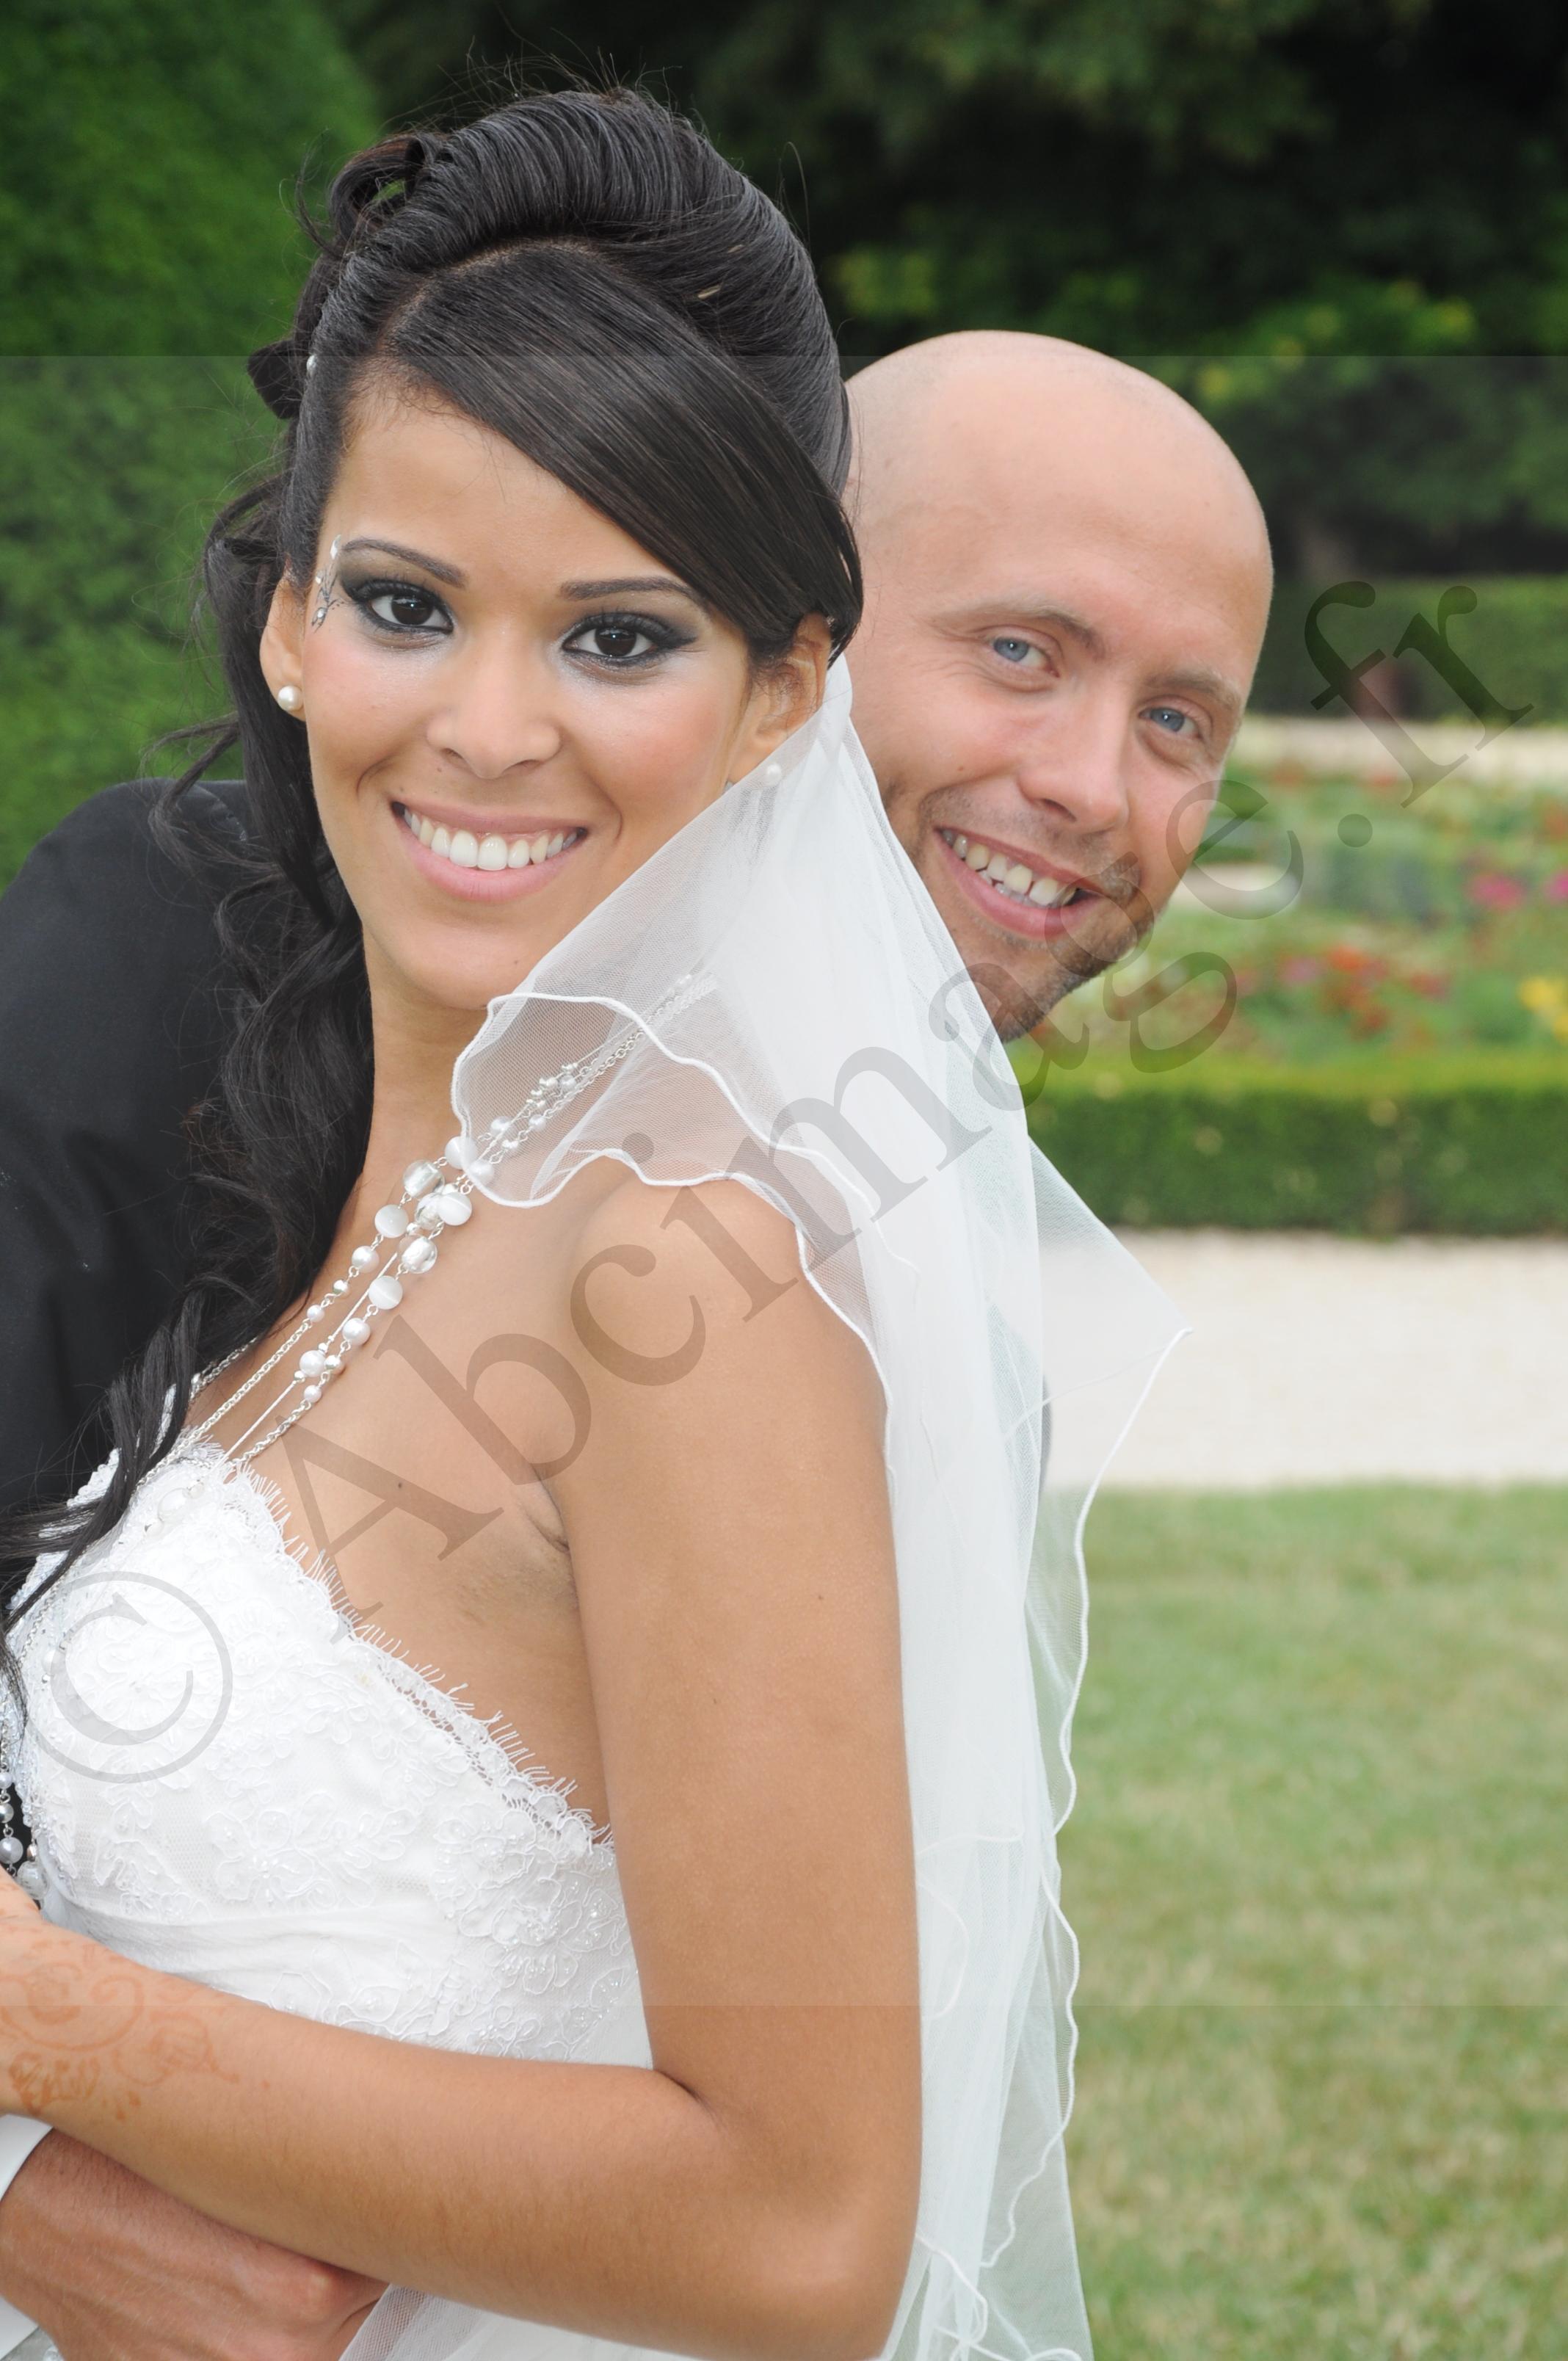 photographe cameraman reportage mariage oriental - Photographe Mariage Oriental